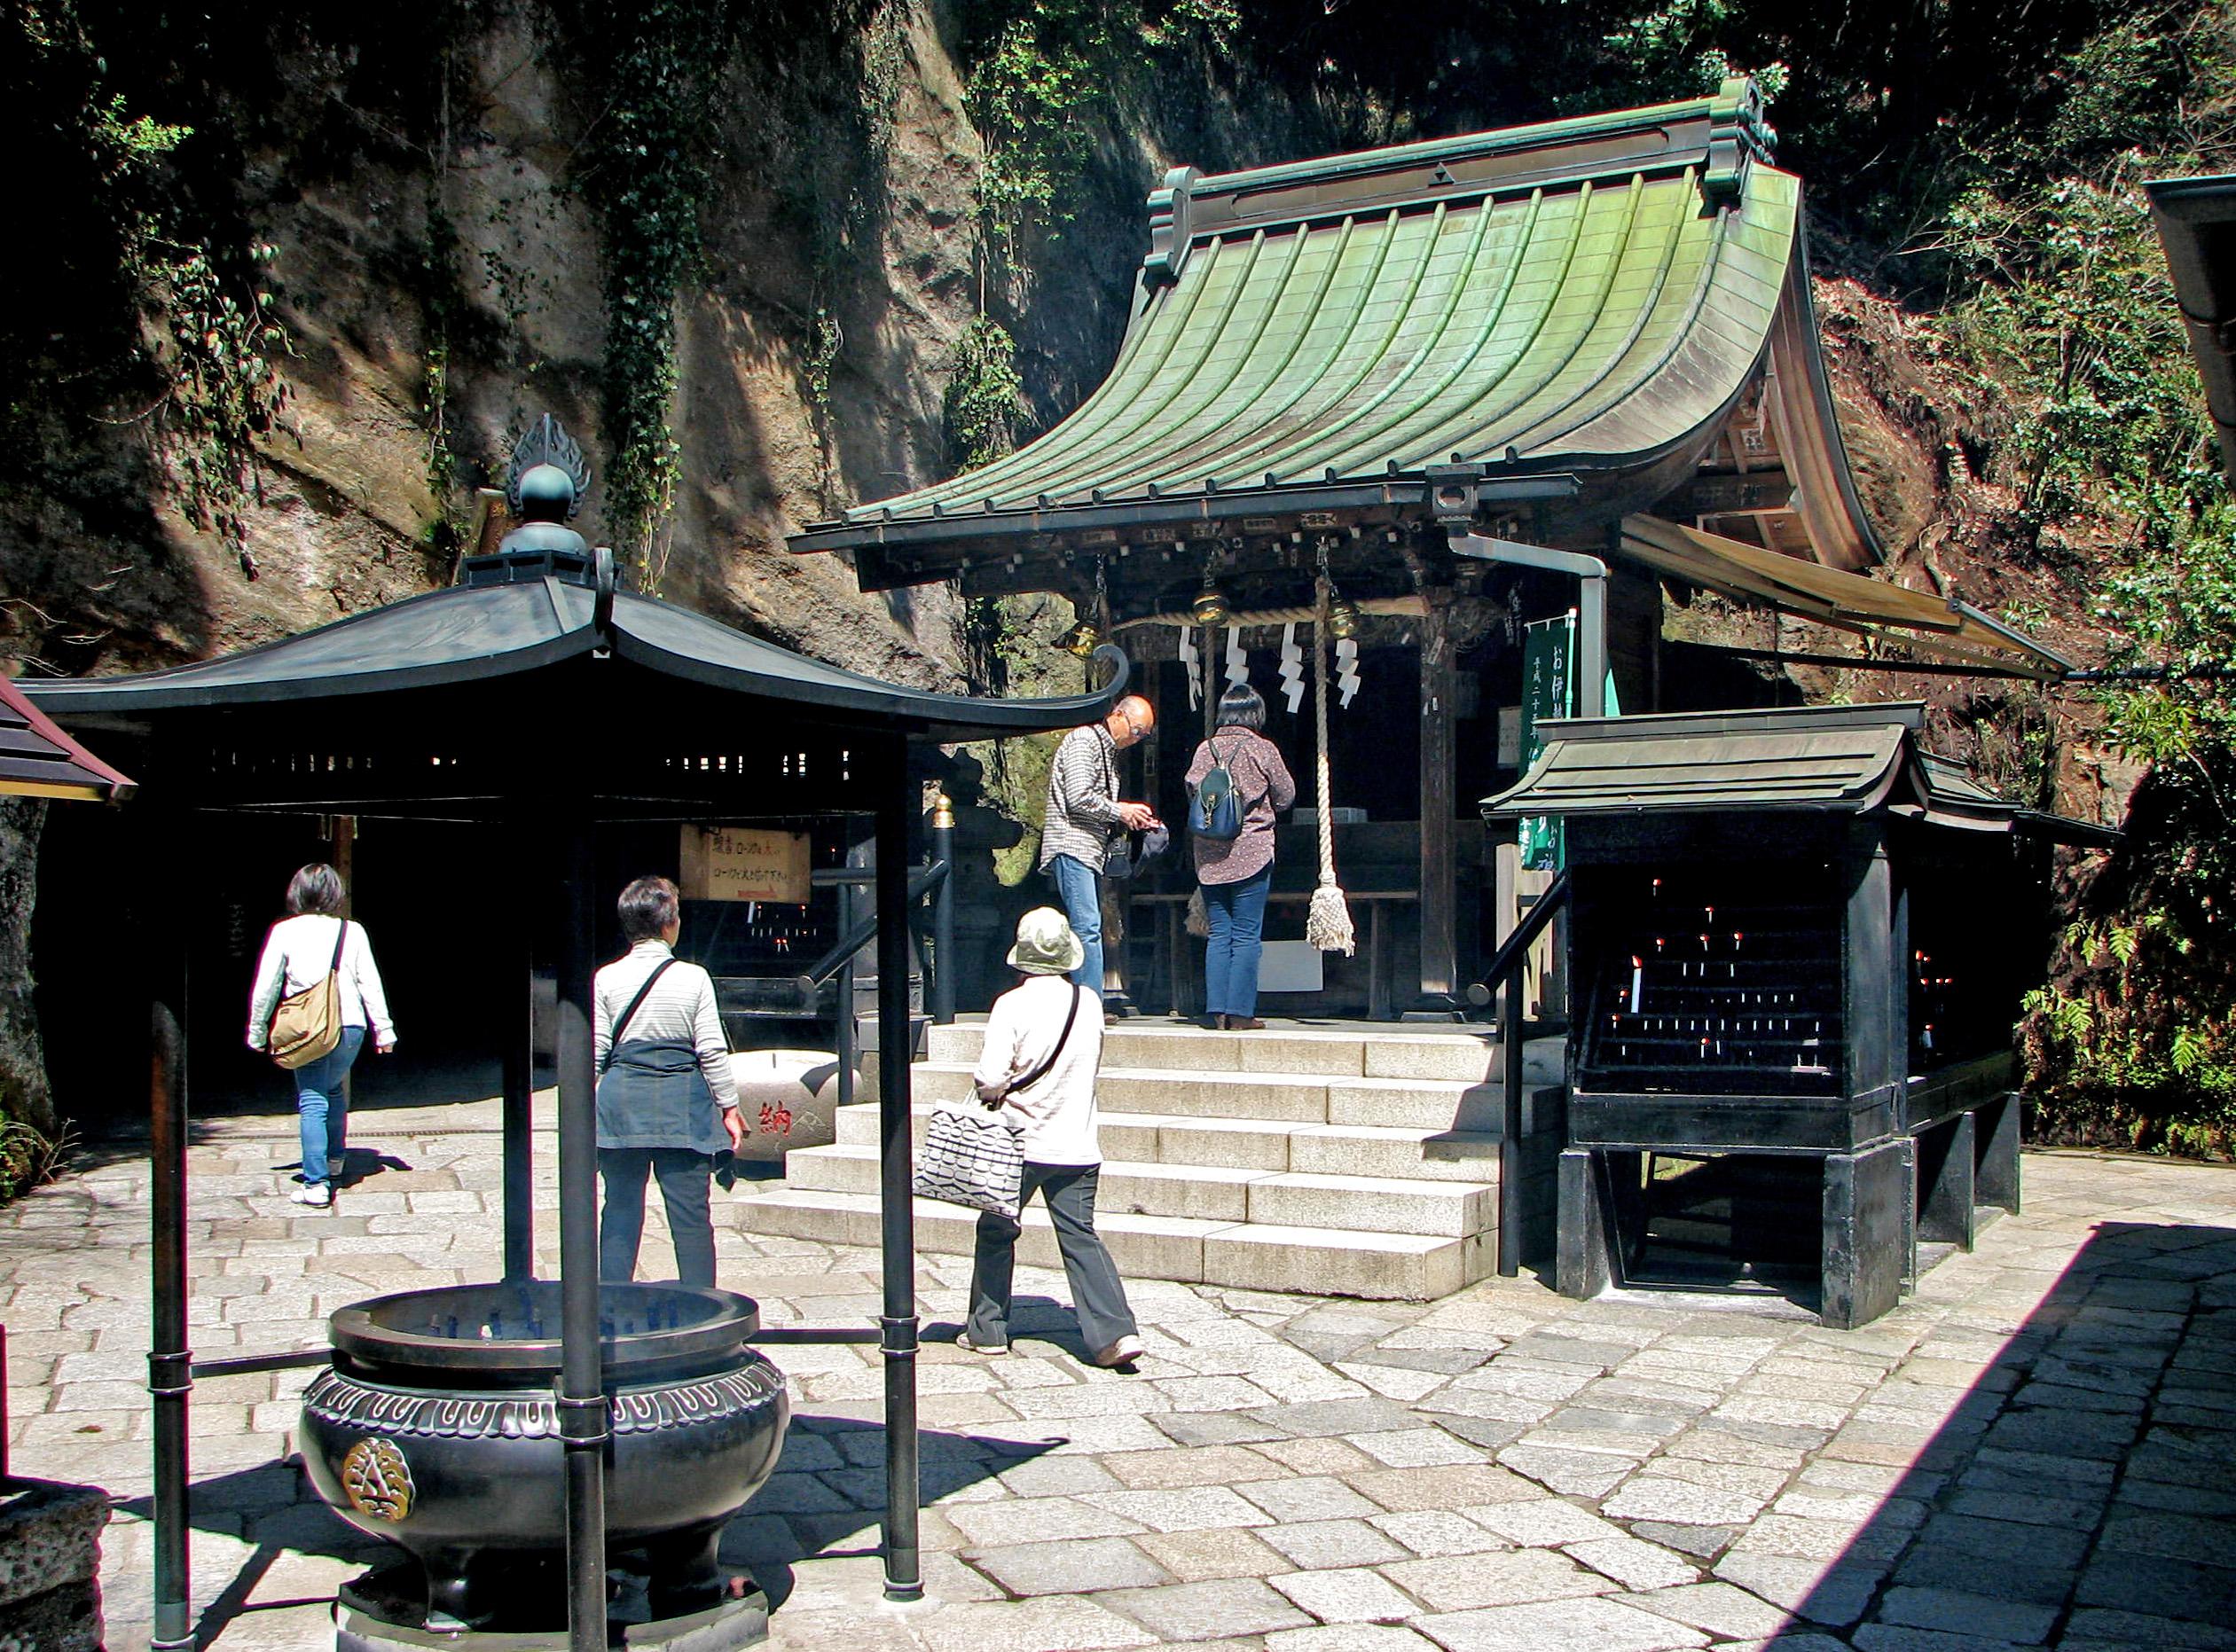 http://upload.wikimedia.org/wikipedia/commons/3/32/Zeniarai_Benten_shrine.jpg